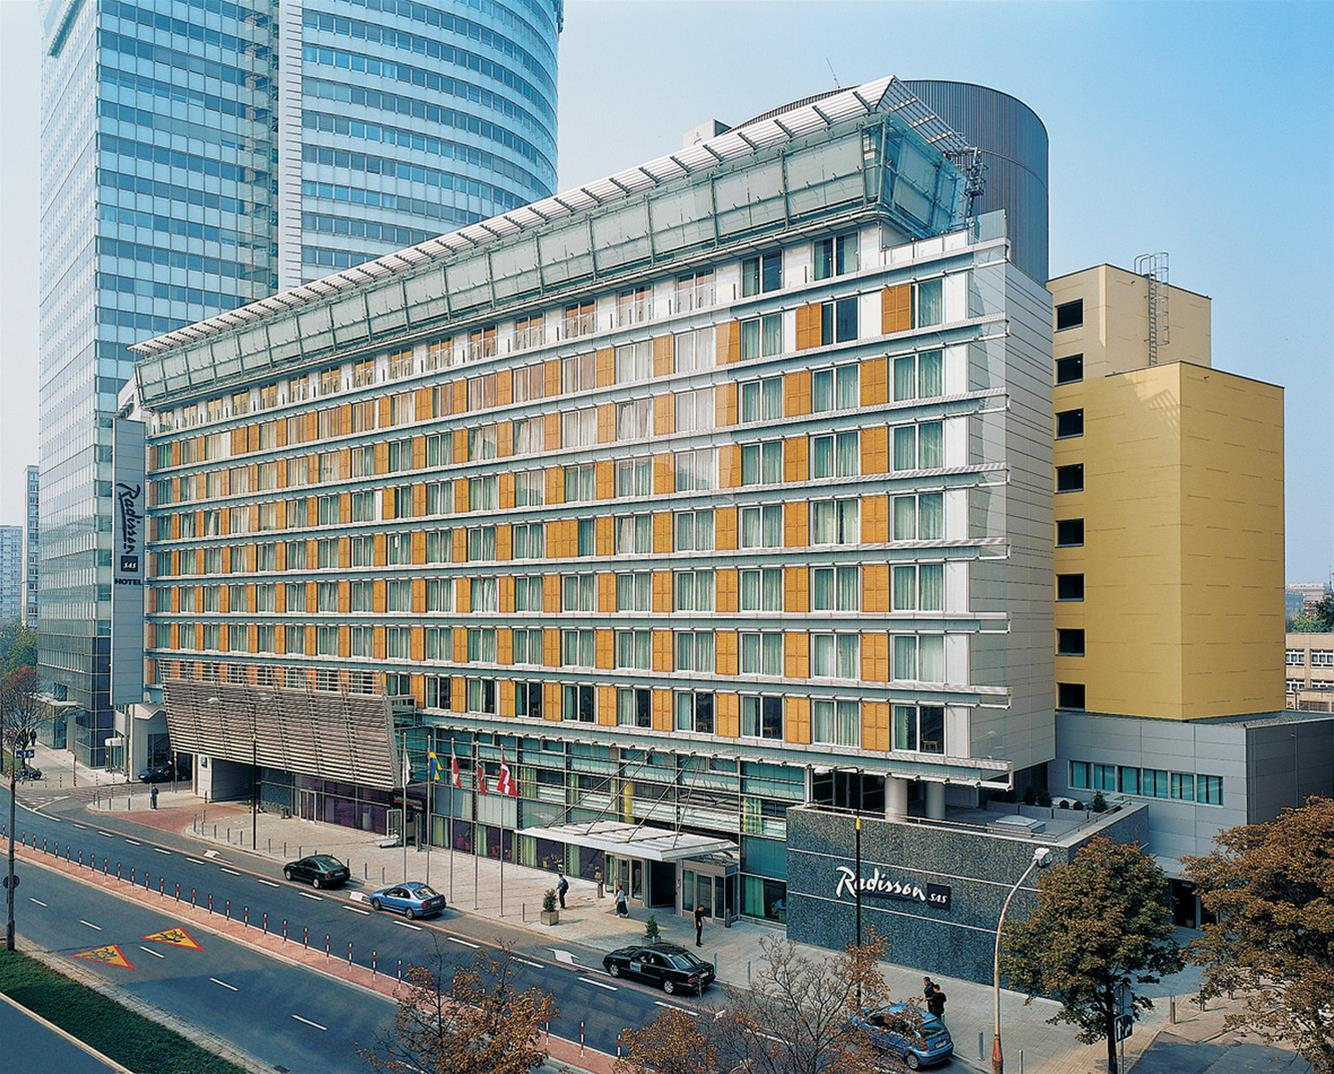 Radisson Blu Centrum Warsaw - Poland - Warsaw